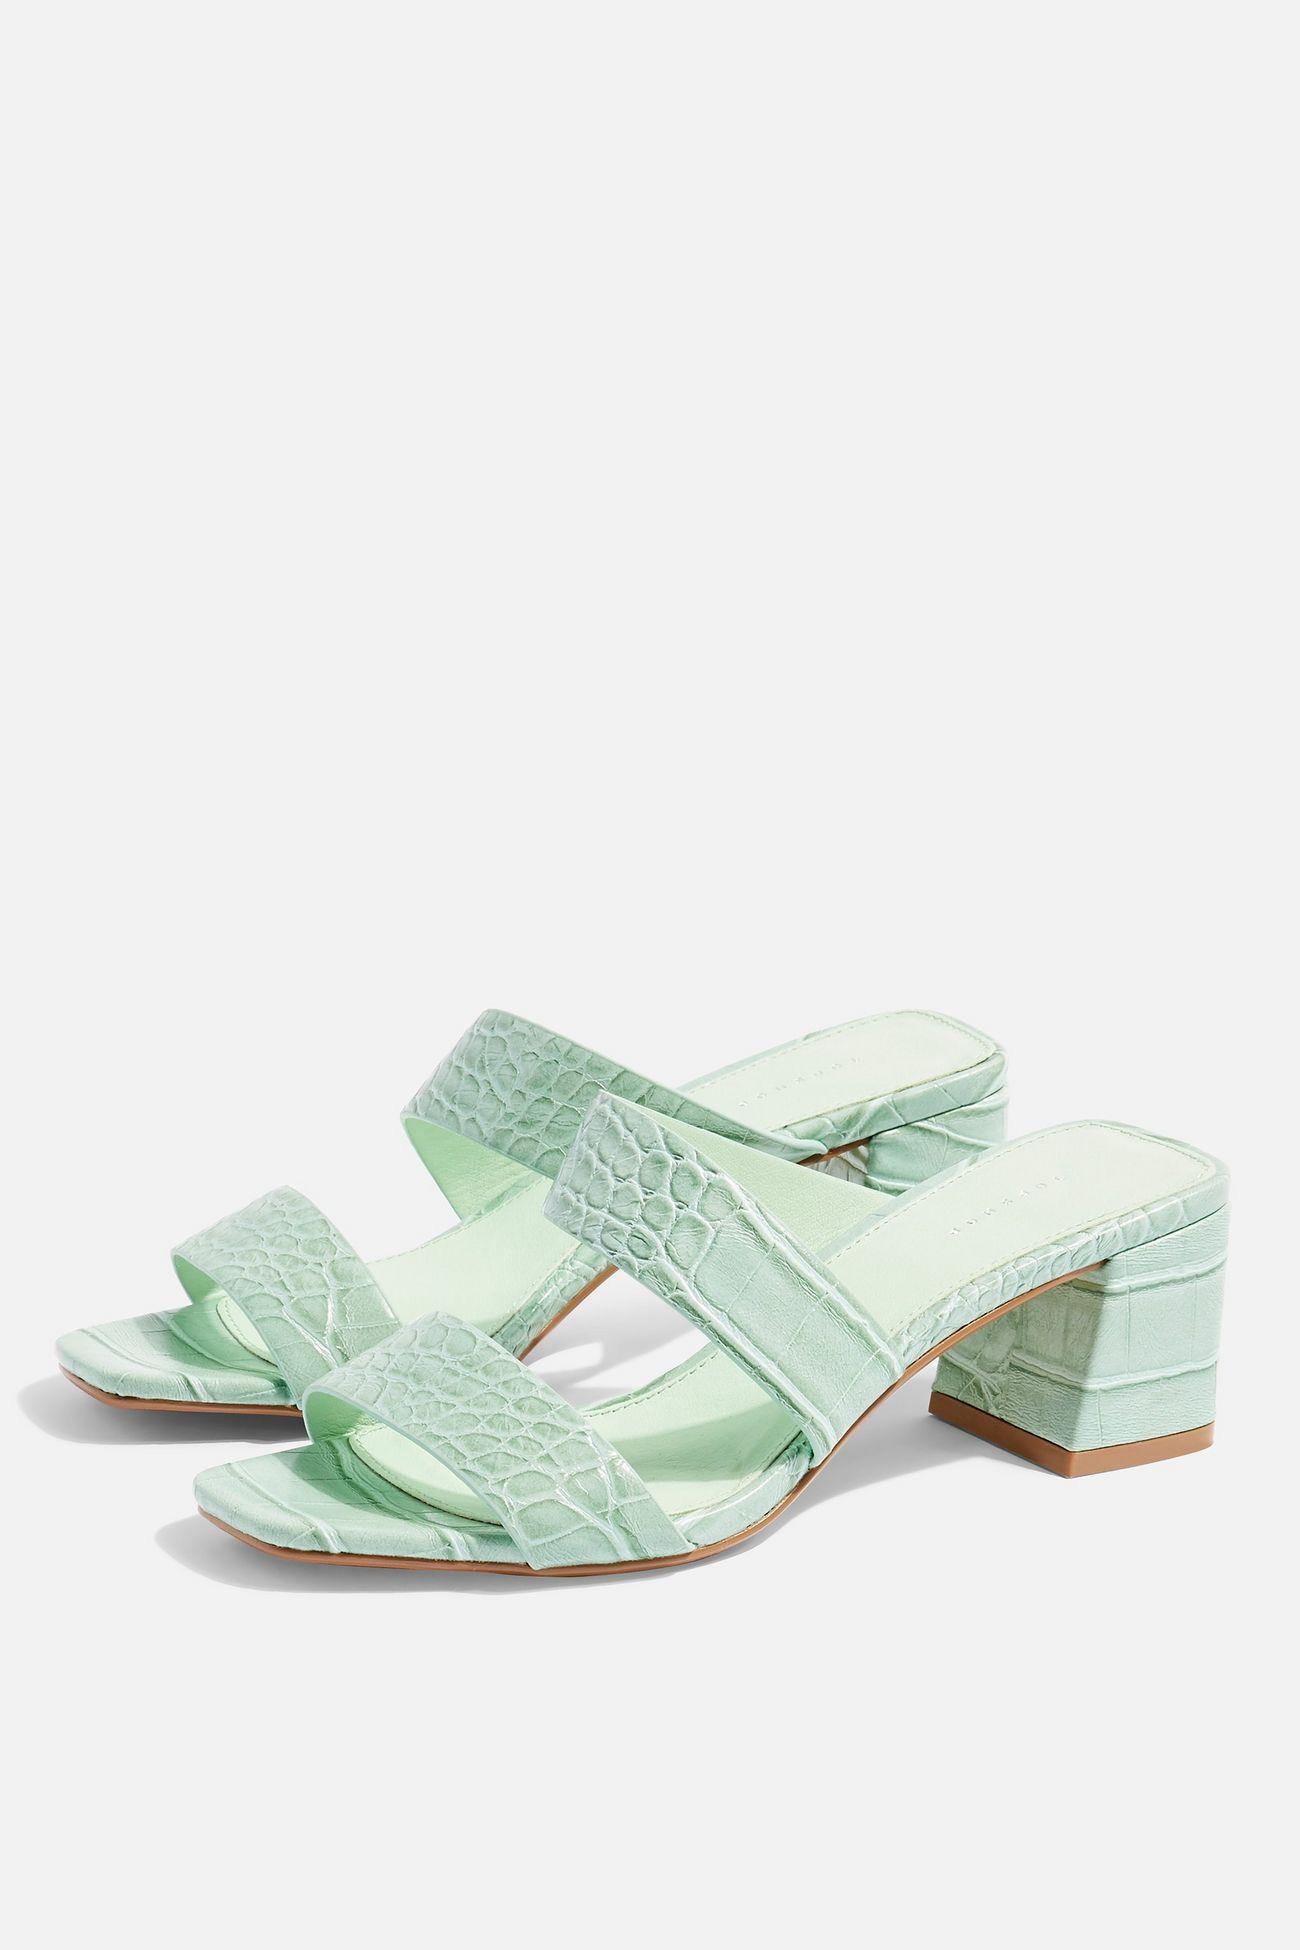 144ccb394ae Shoe Addicted: 10 καλοκαιρινά παπούτσια μέχρι €30 που αξίζει να ...